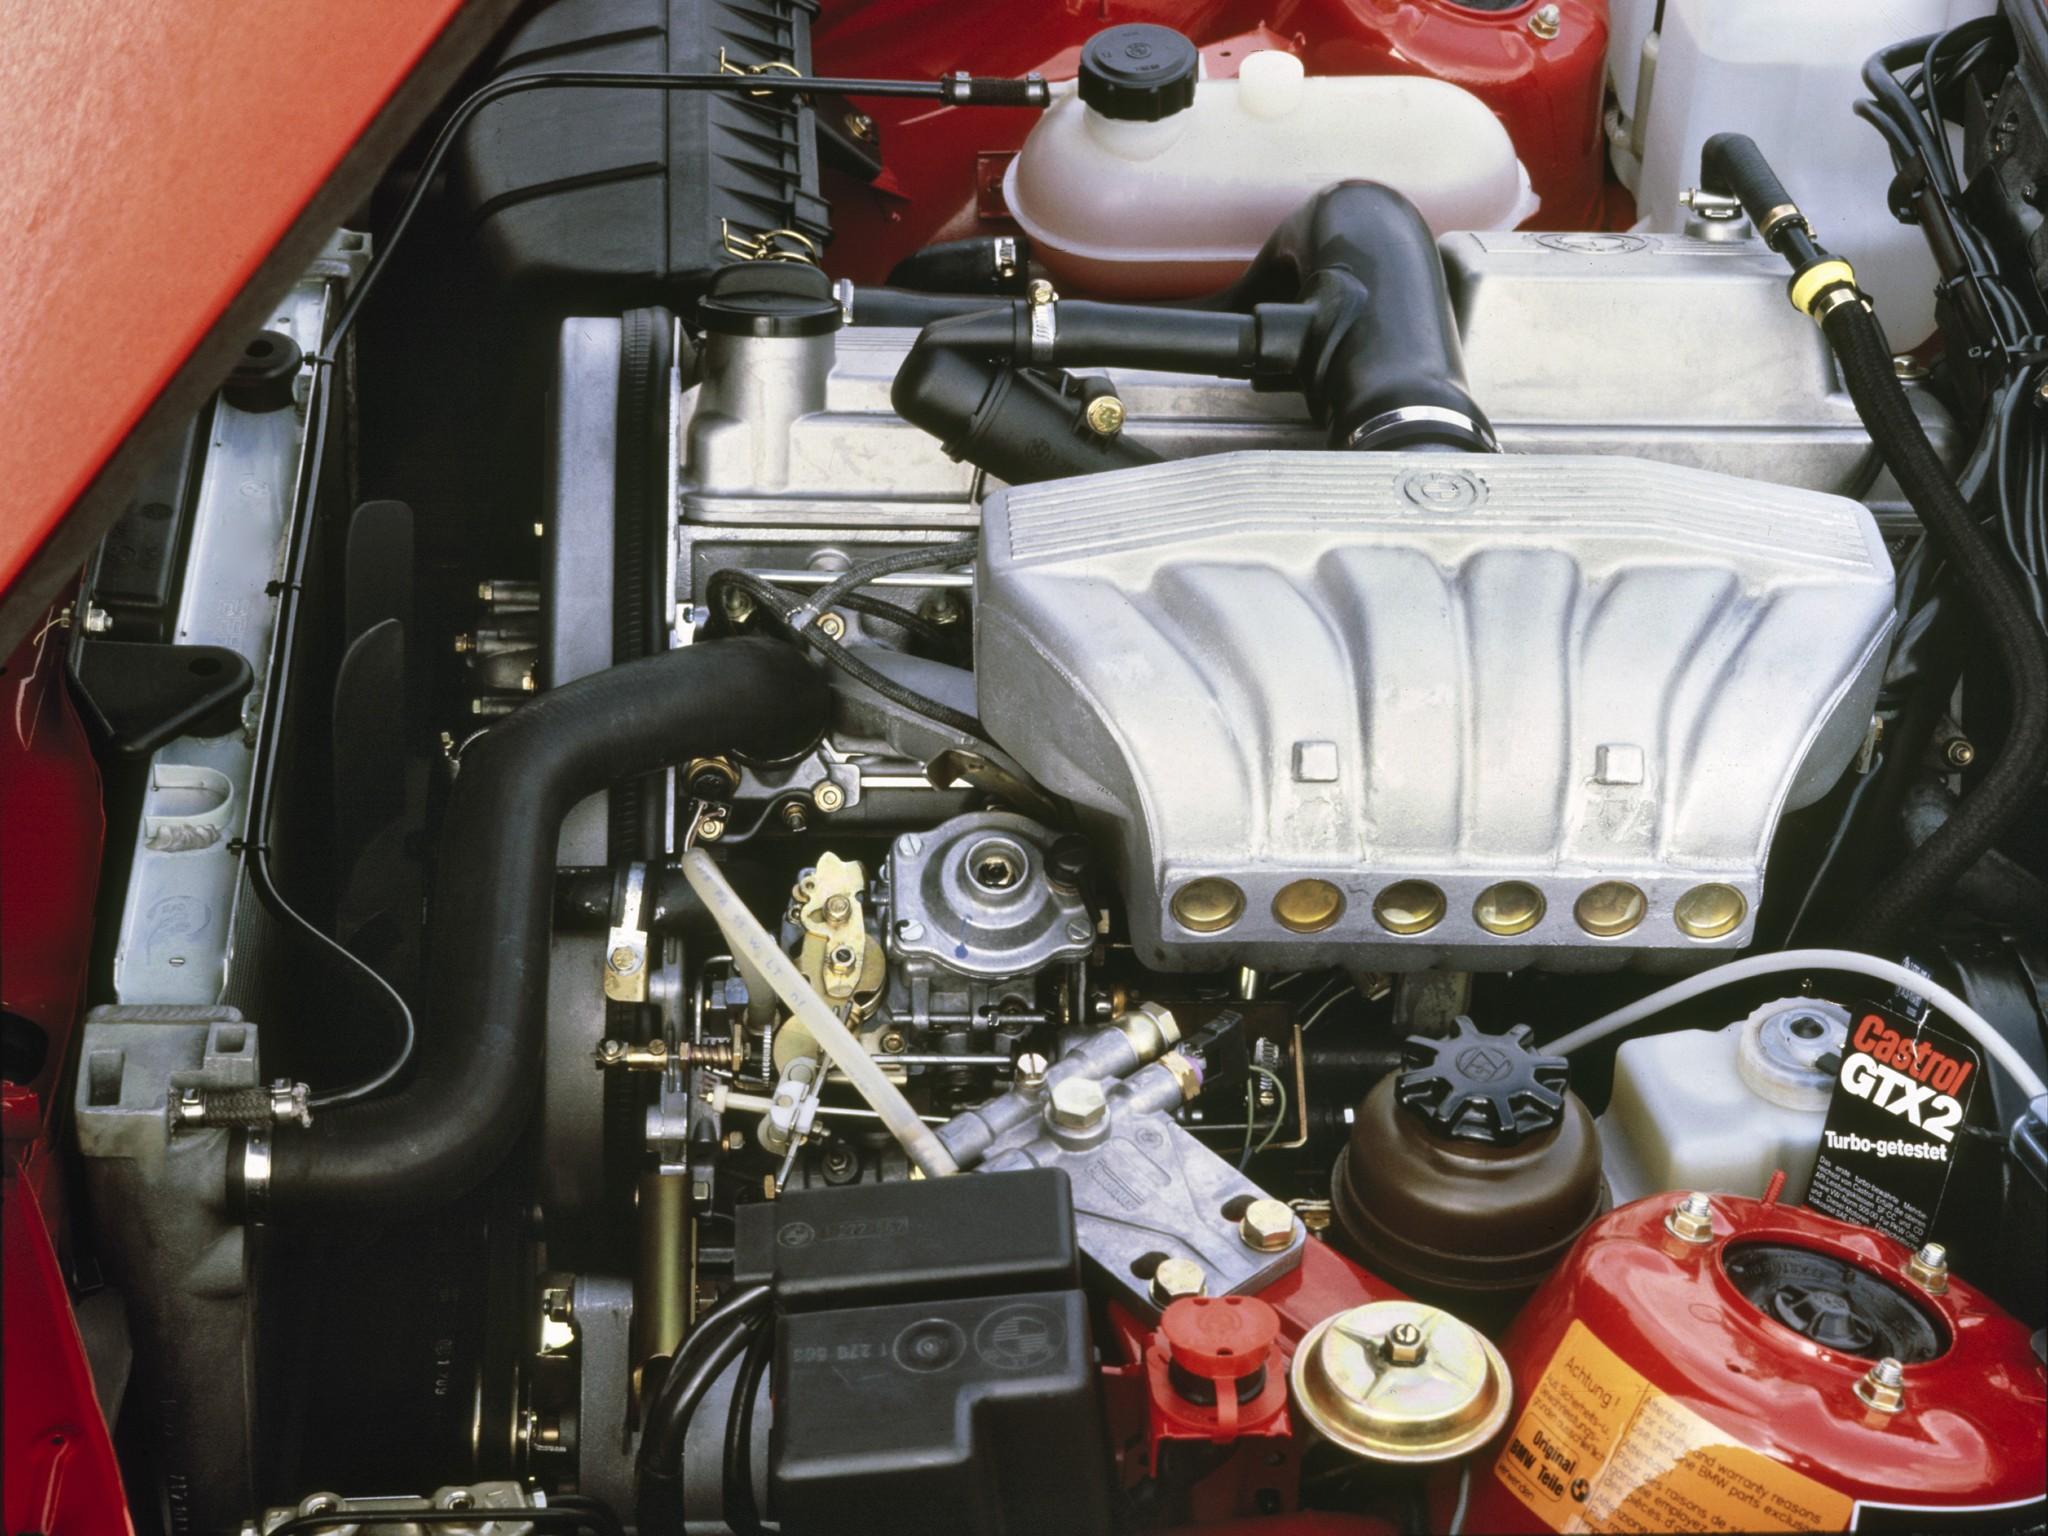 Bmw 3 Series Sedan E30 Specs Photos 1982 1983 1984 1985 1986 1987 1988 1989 1990 1991 1992 Autoevolution